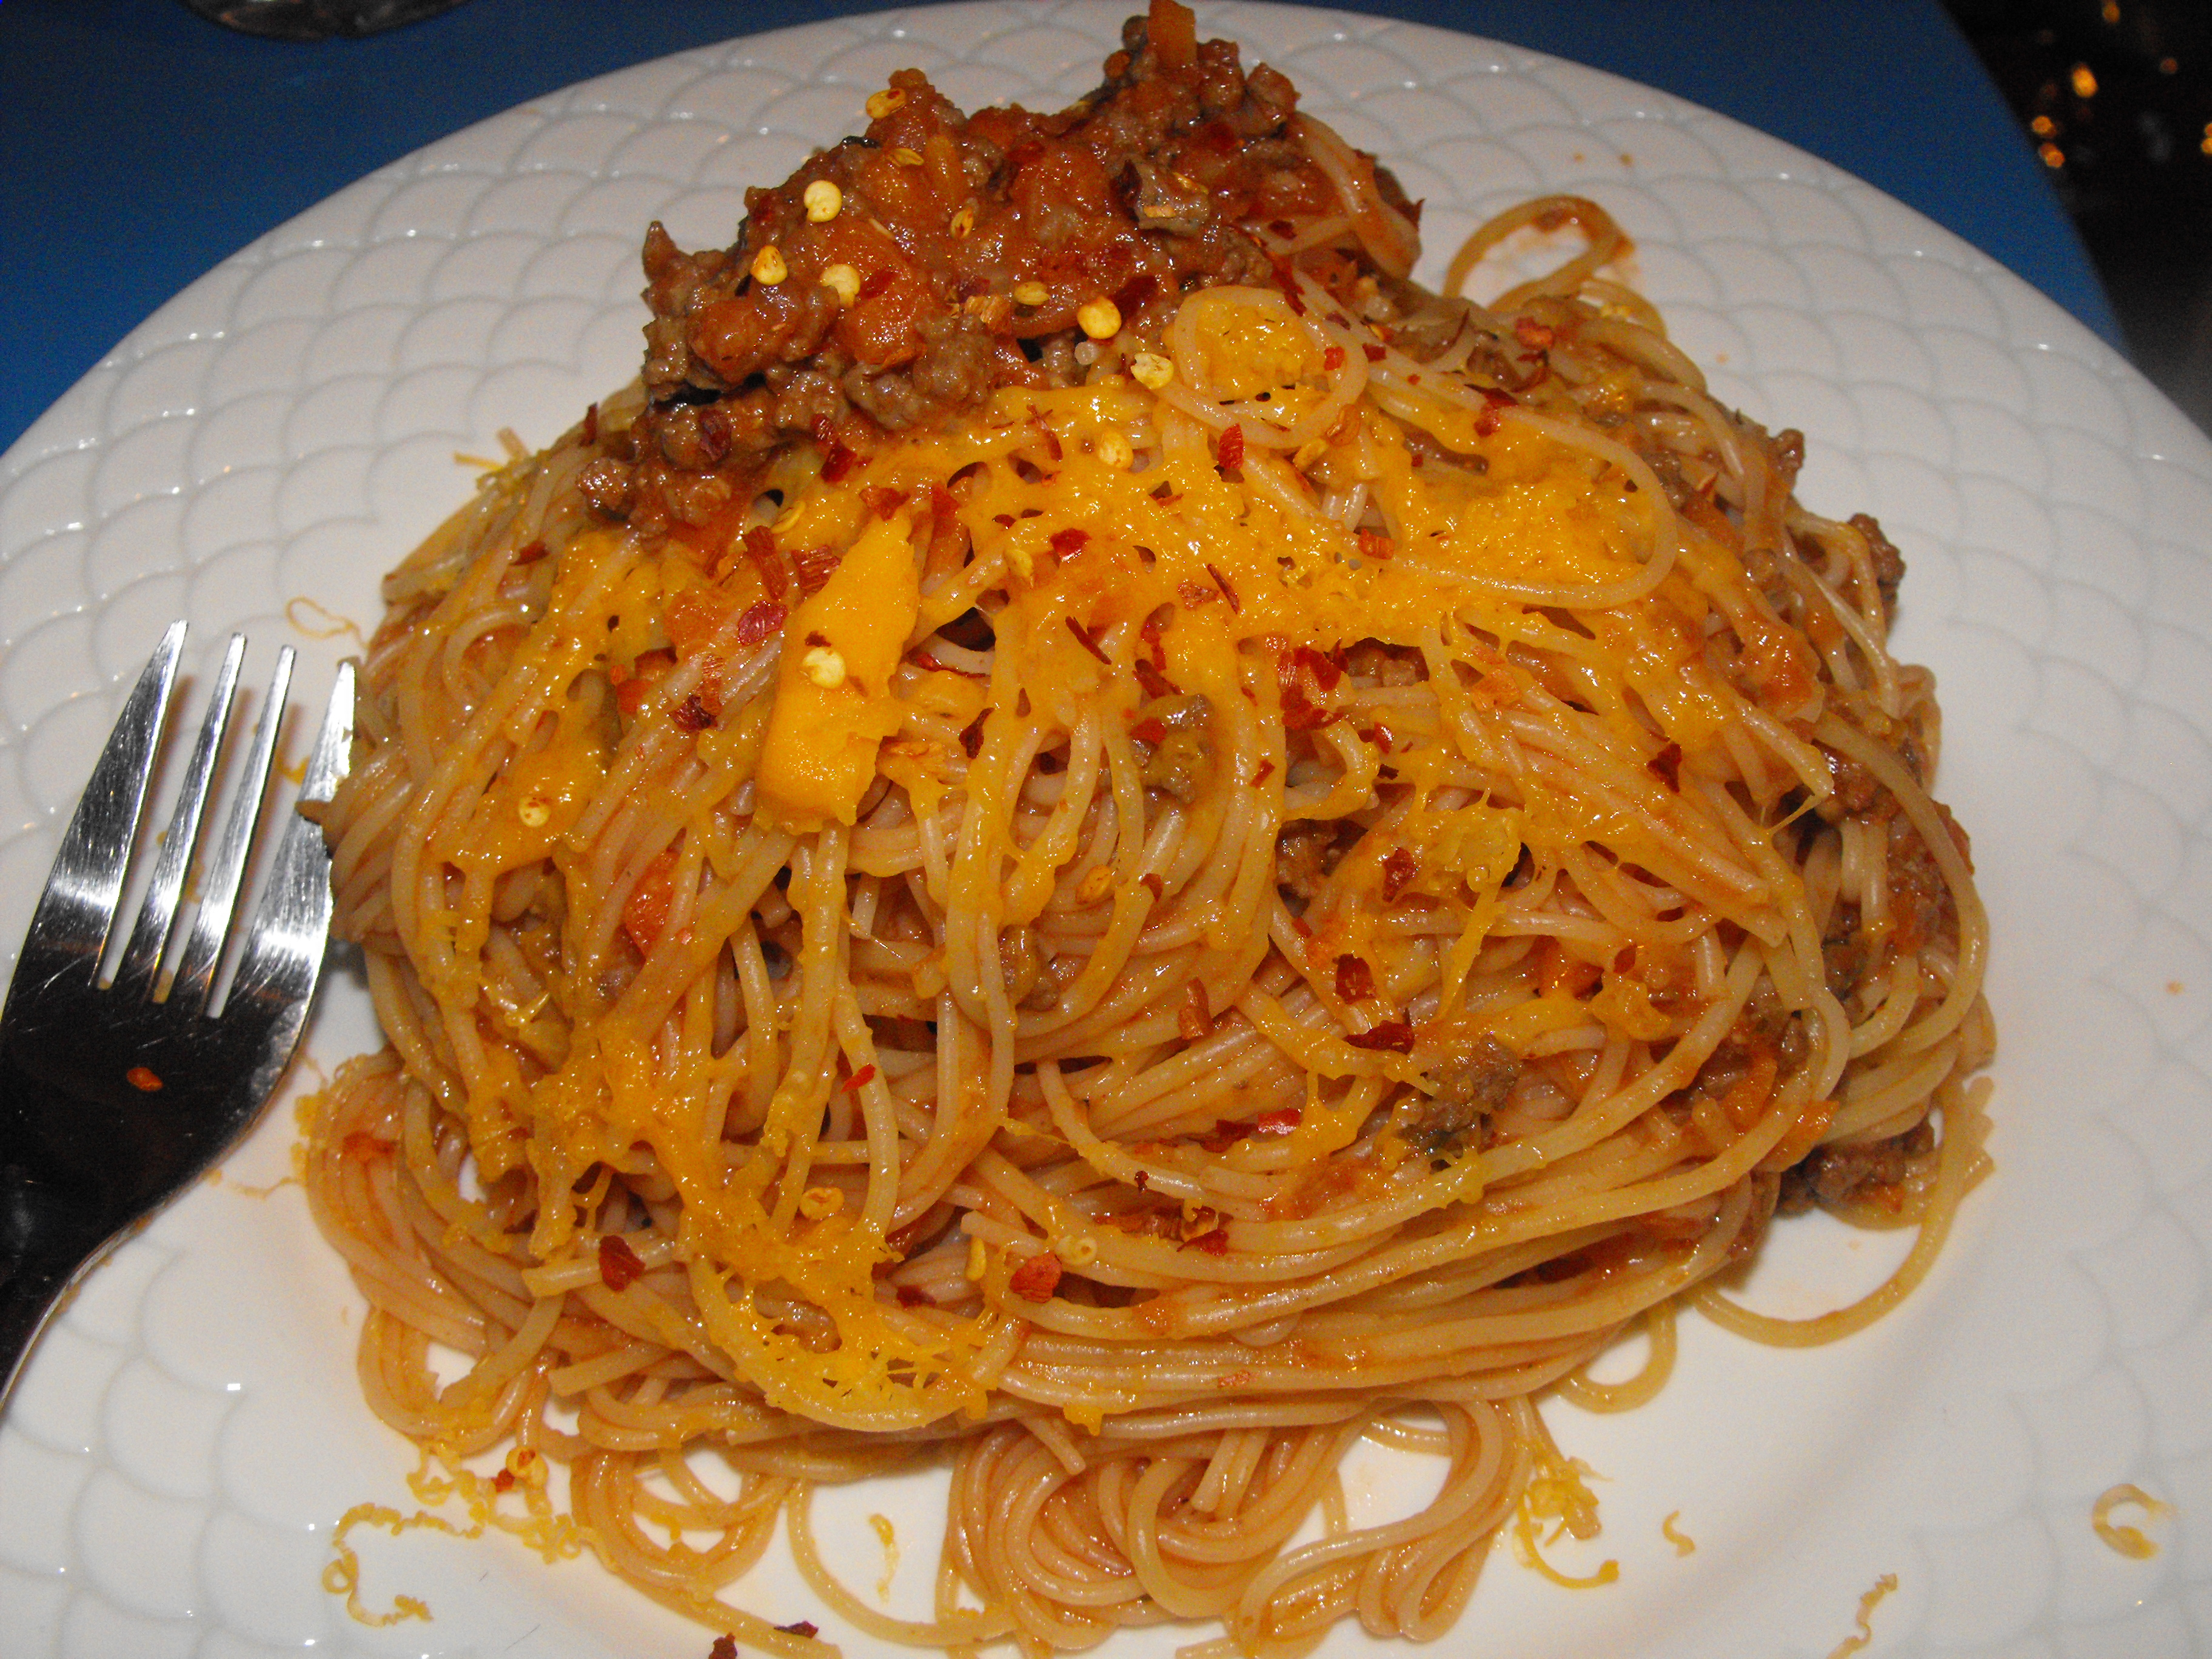 http://foodloader.net/cutie_2010-01-14_spaghetti.jpg